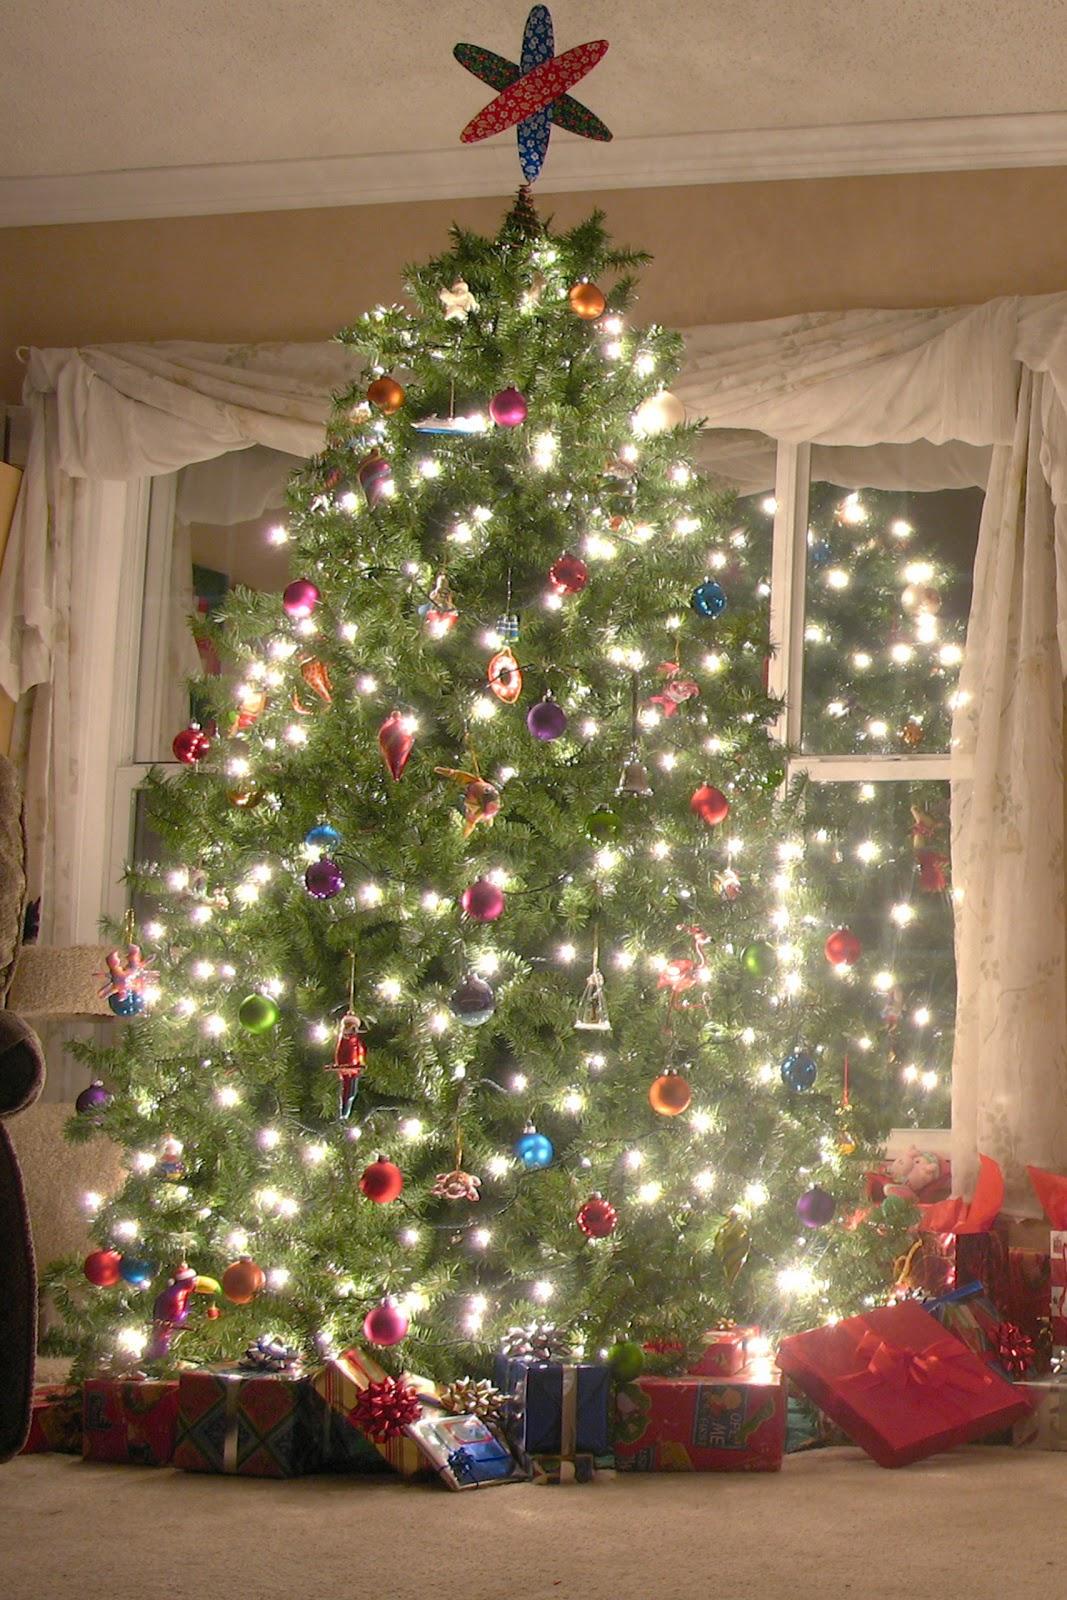 http://4.bp.blogspot.com/-fLu9h-mUqCI/TvGlqrE07rI/AAAAAAAAB4I/qWuVhMjdUm8/s1600/Christmas+tree_iphone+_new+years+eve_wallpaper_1.jpg